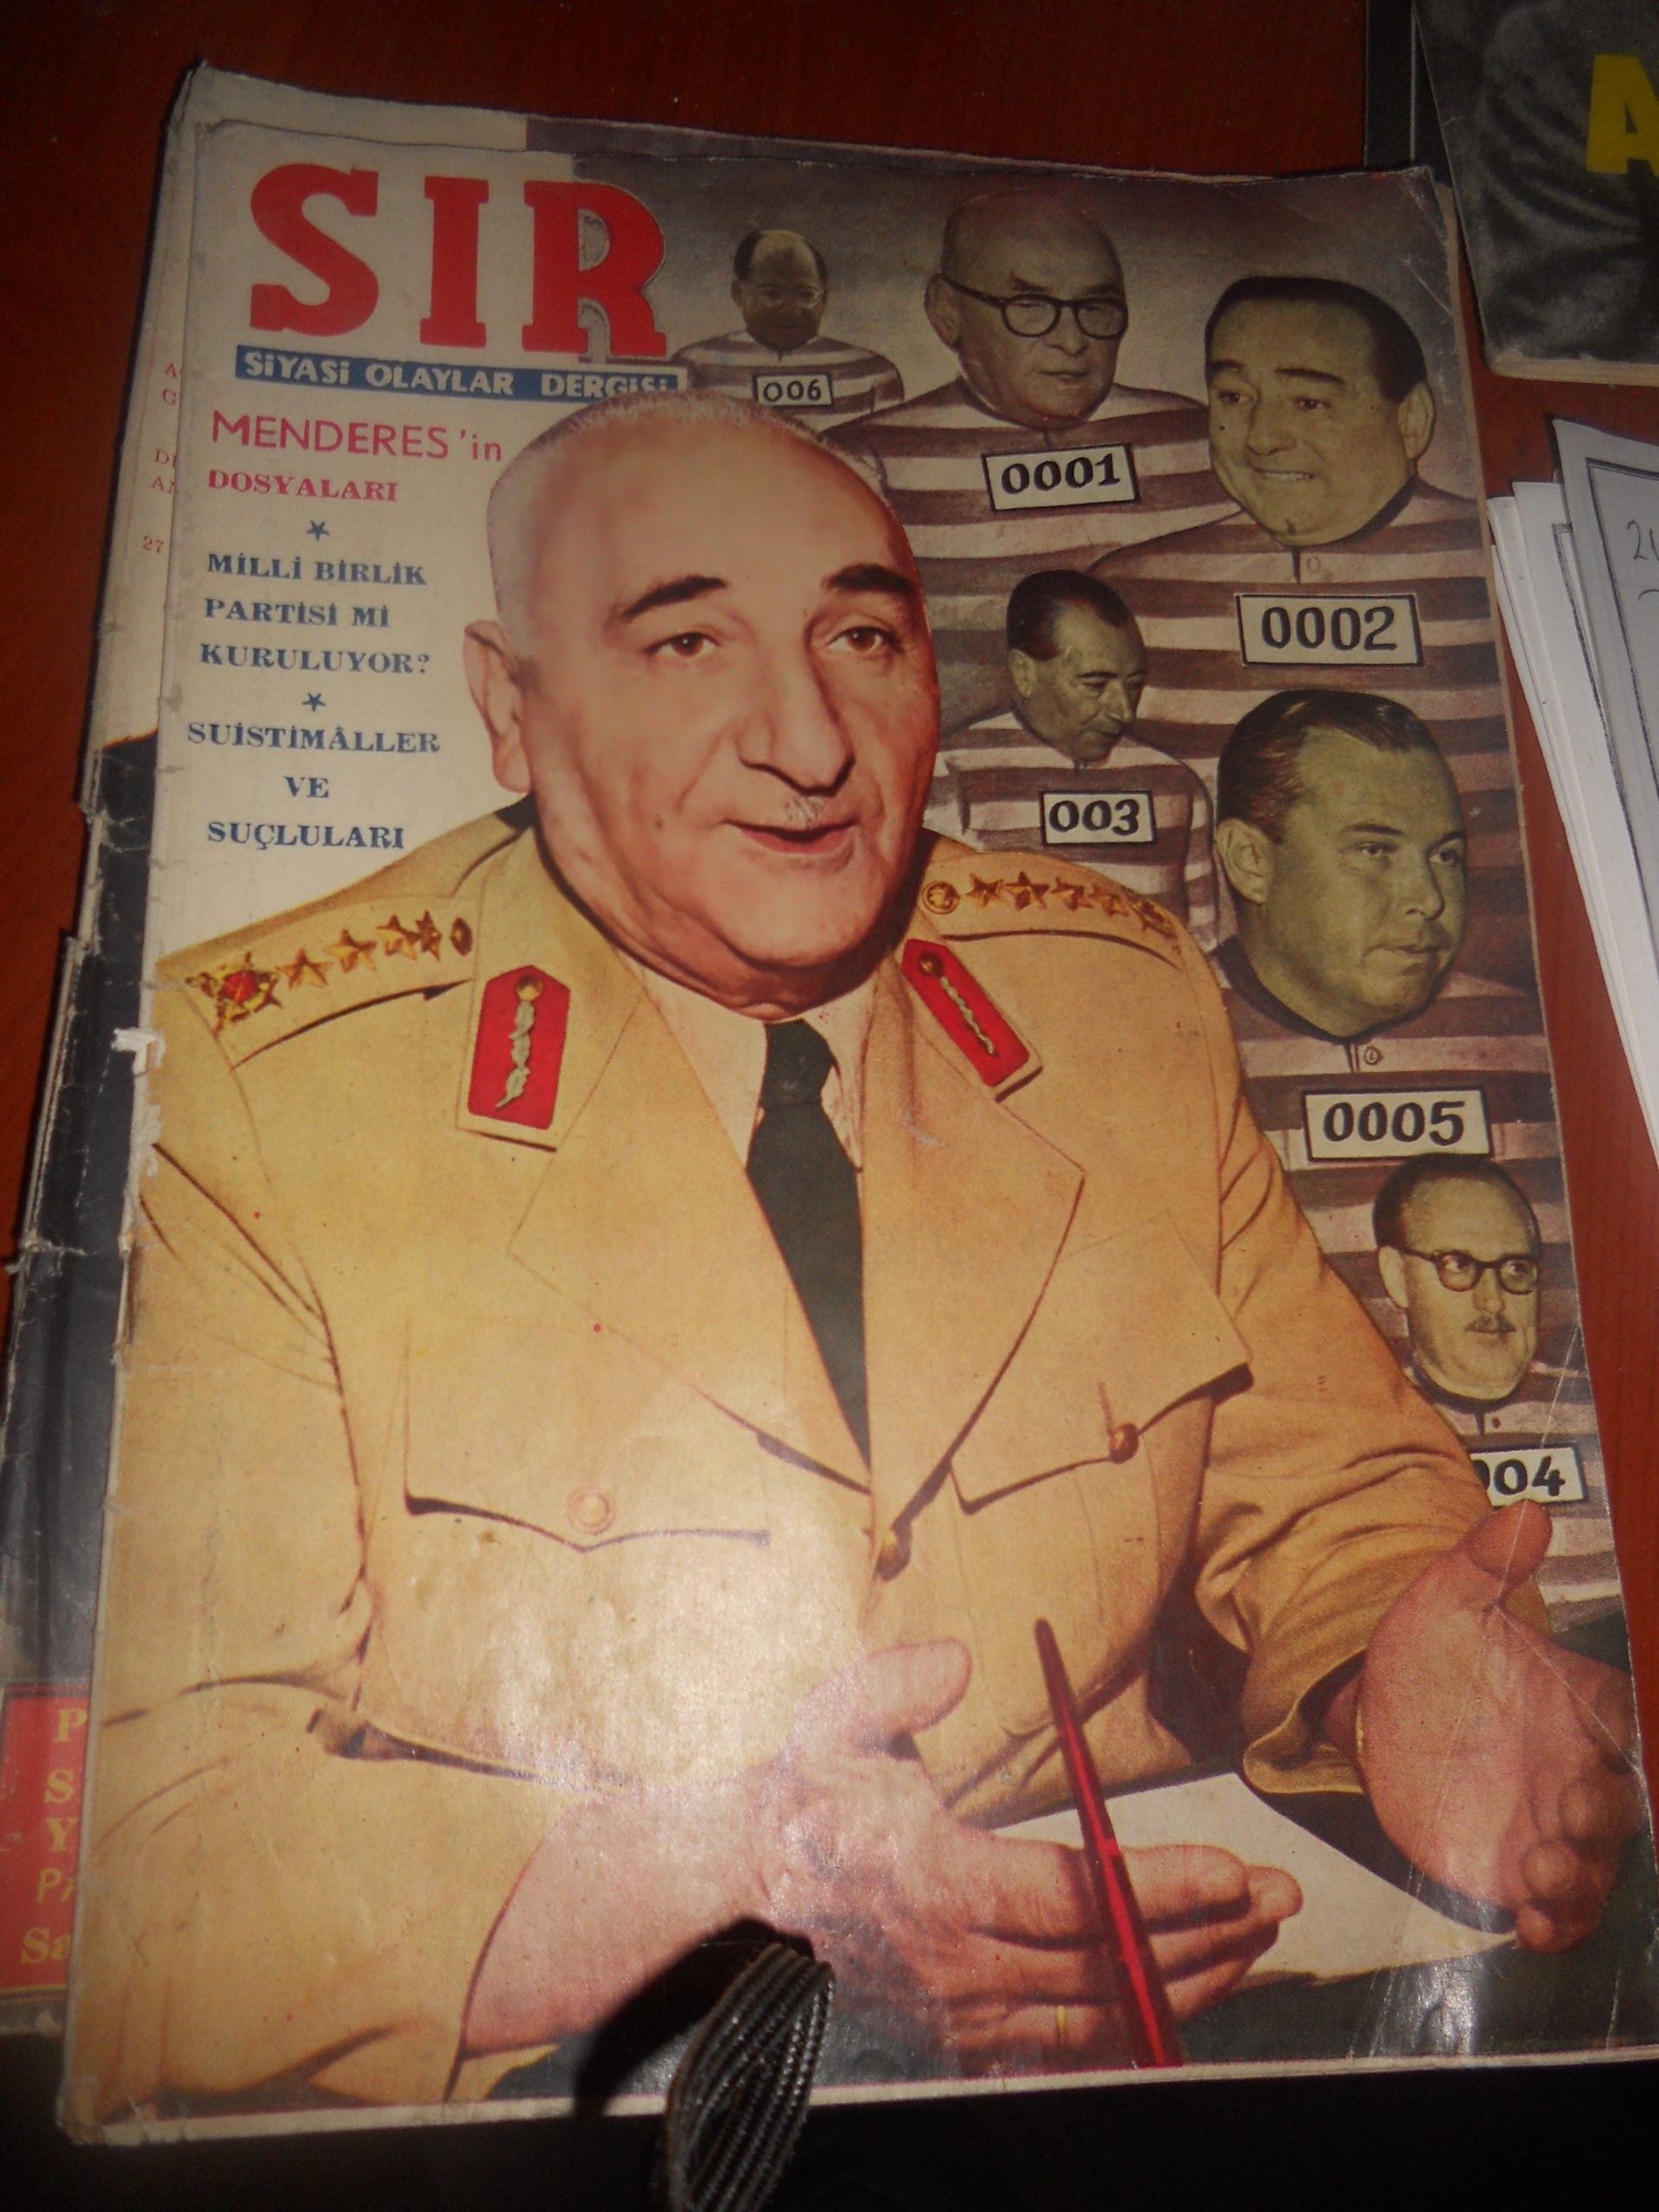 SIR dergisi/21.06.1960 /2 adet/ toplam 10 tl